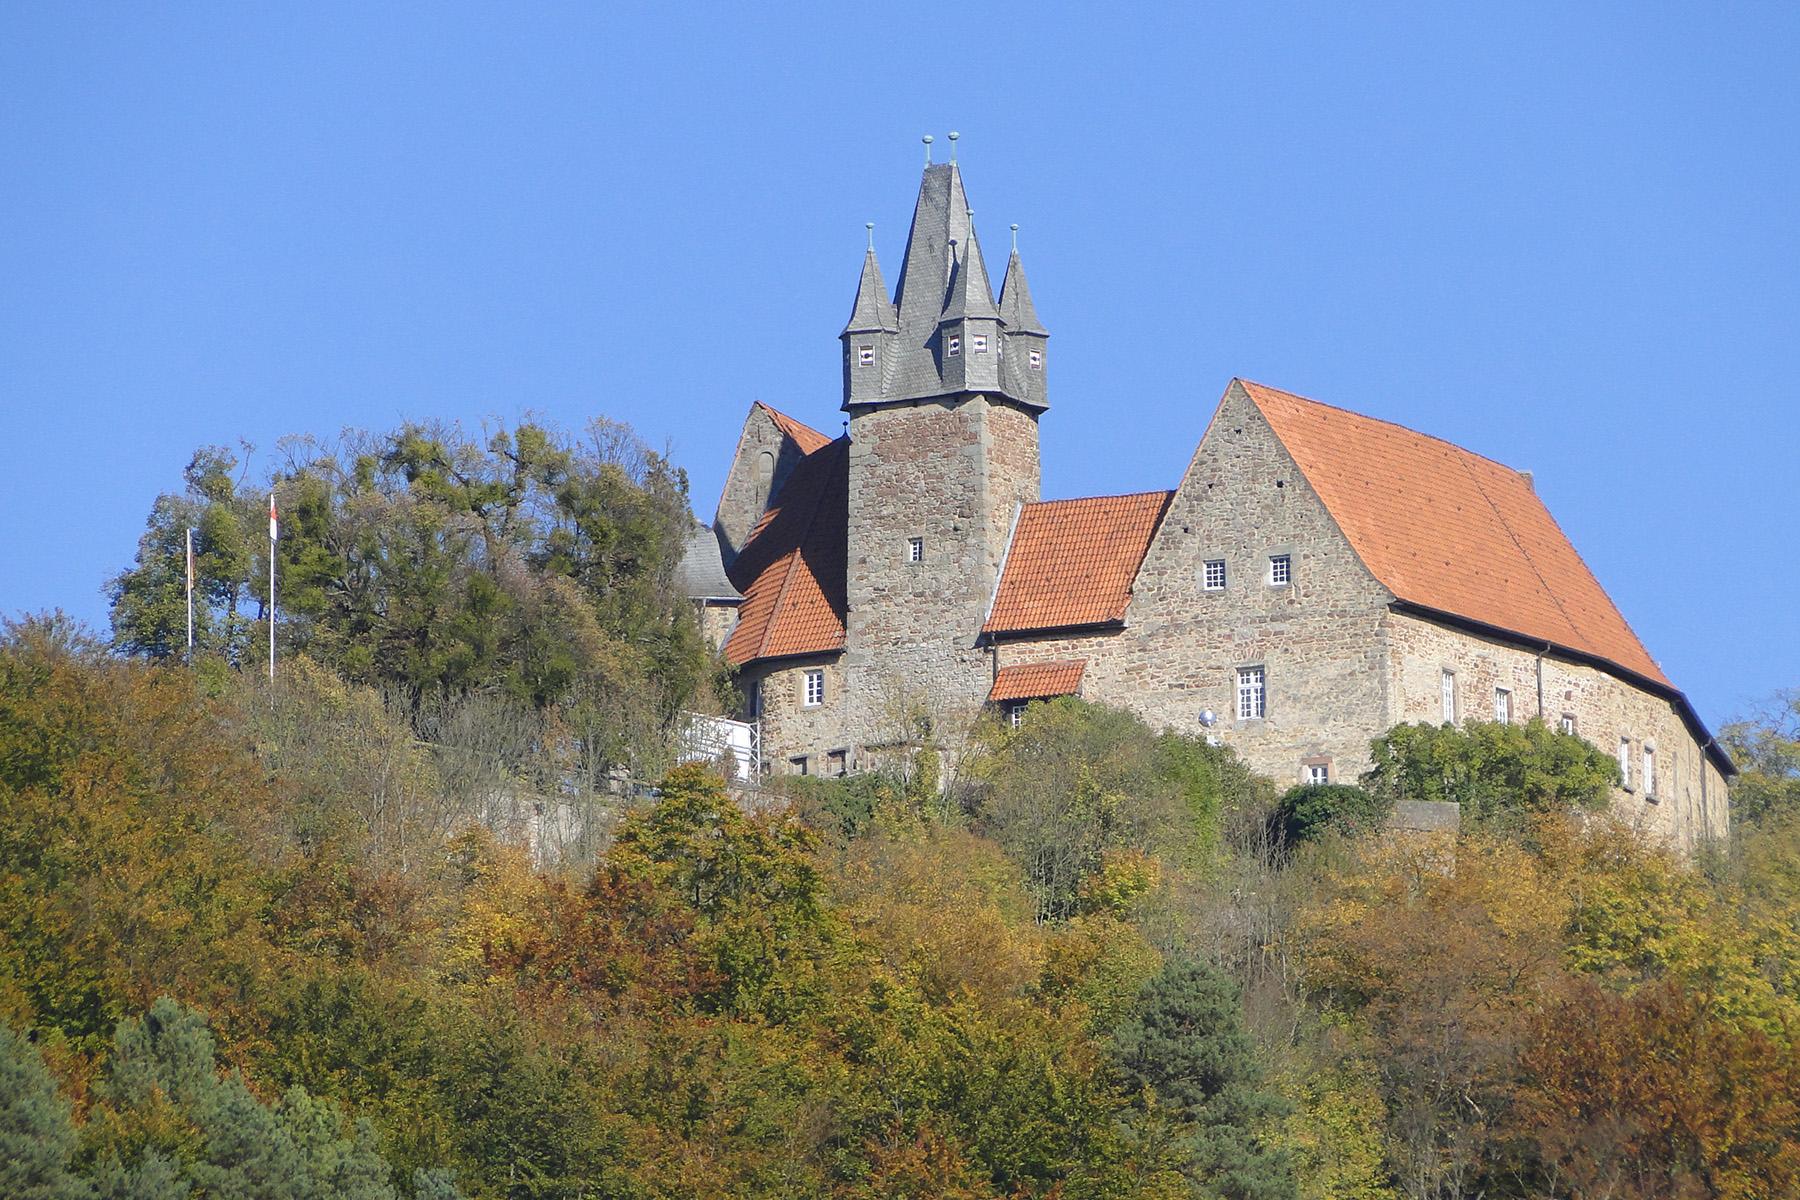 Schloss Spangenberg, Germany